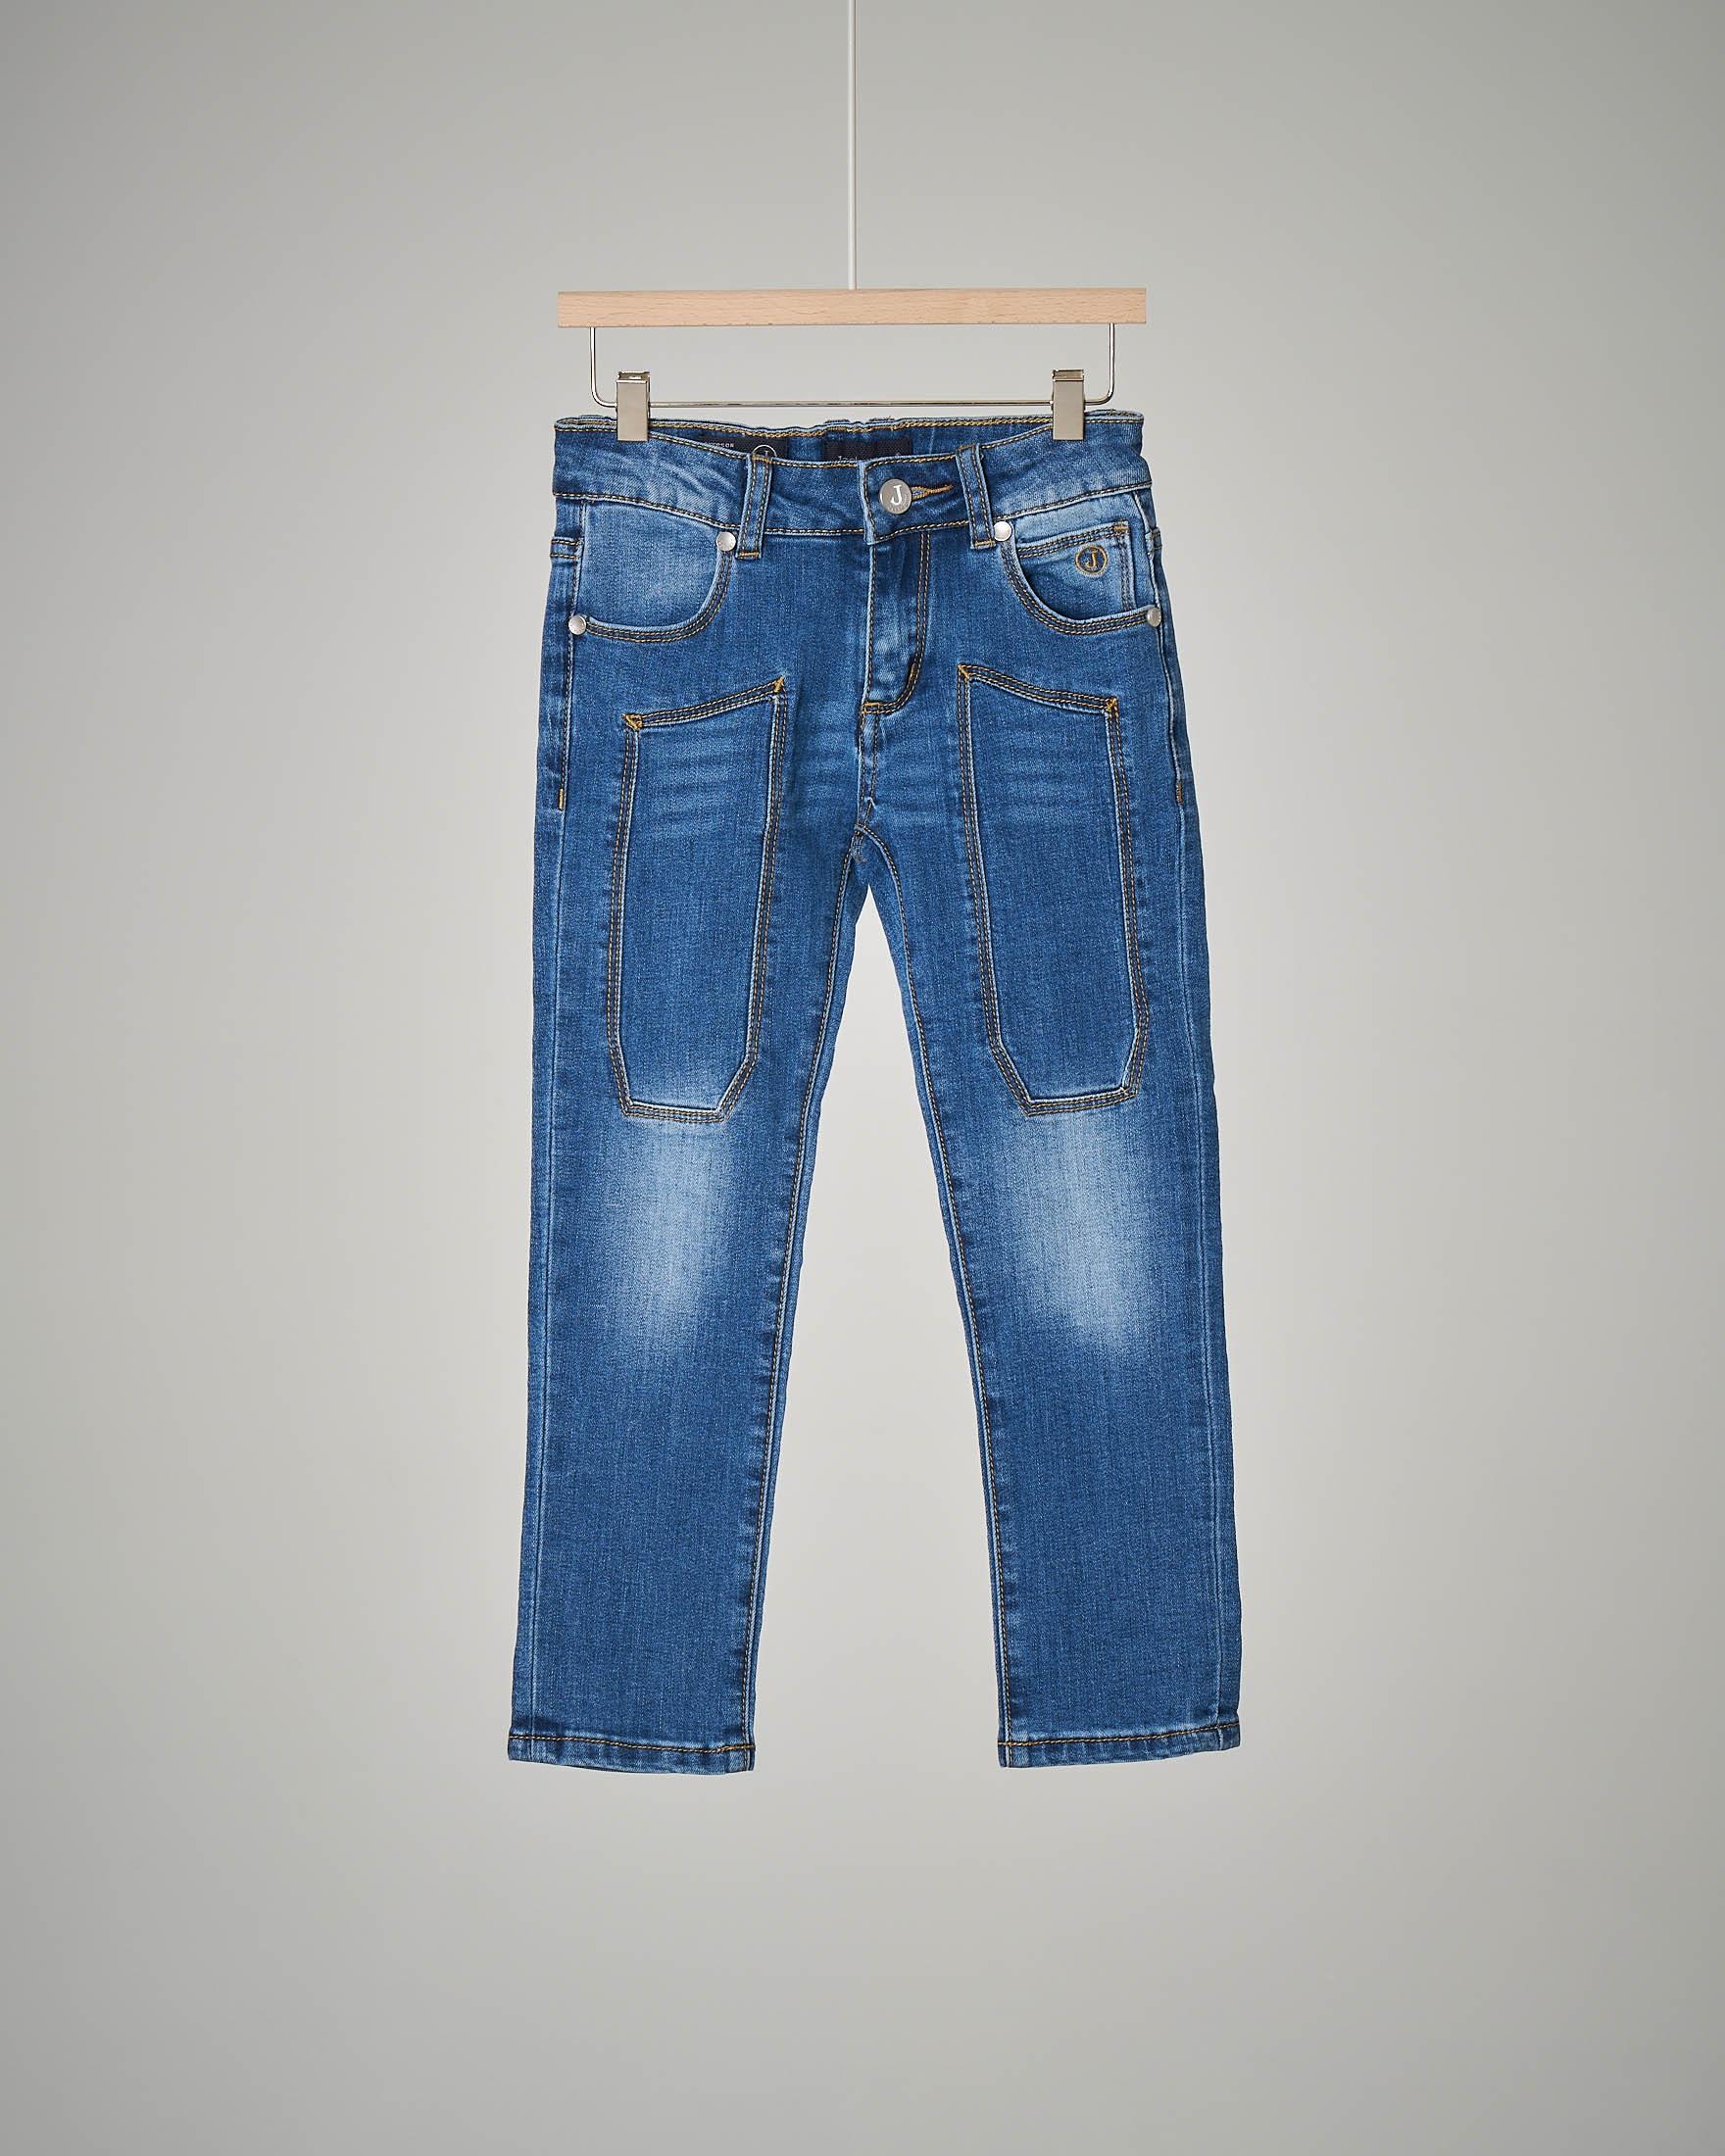 Jeans sbiancato con toppa